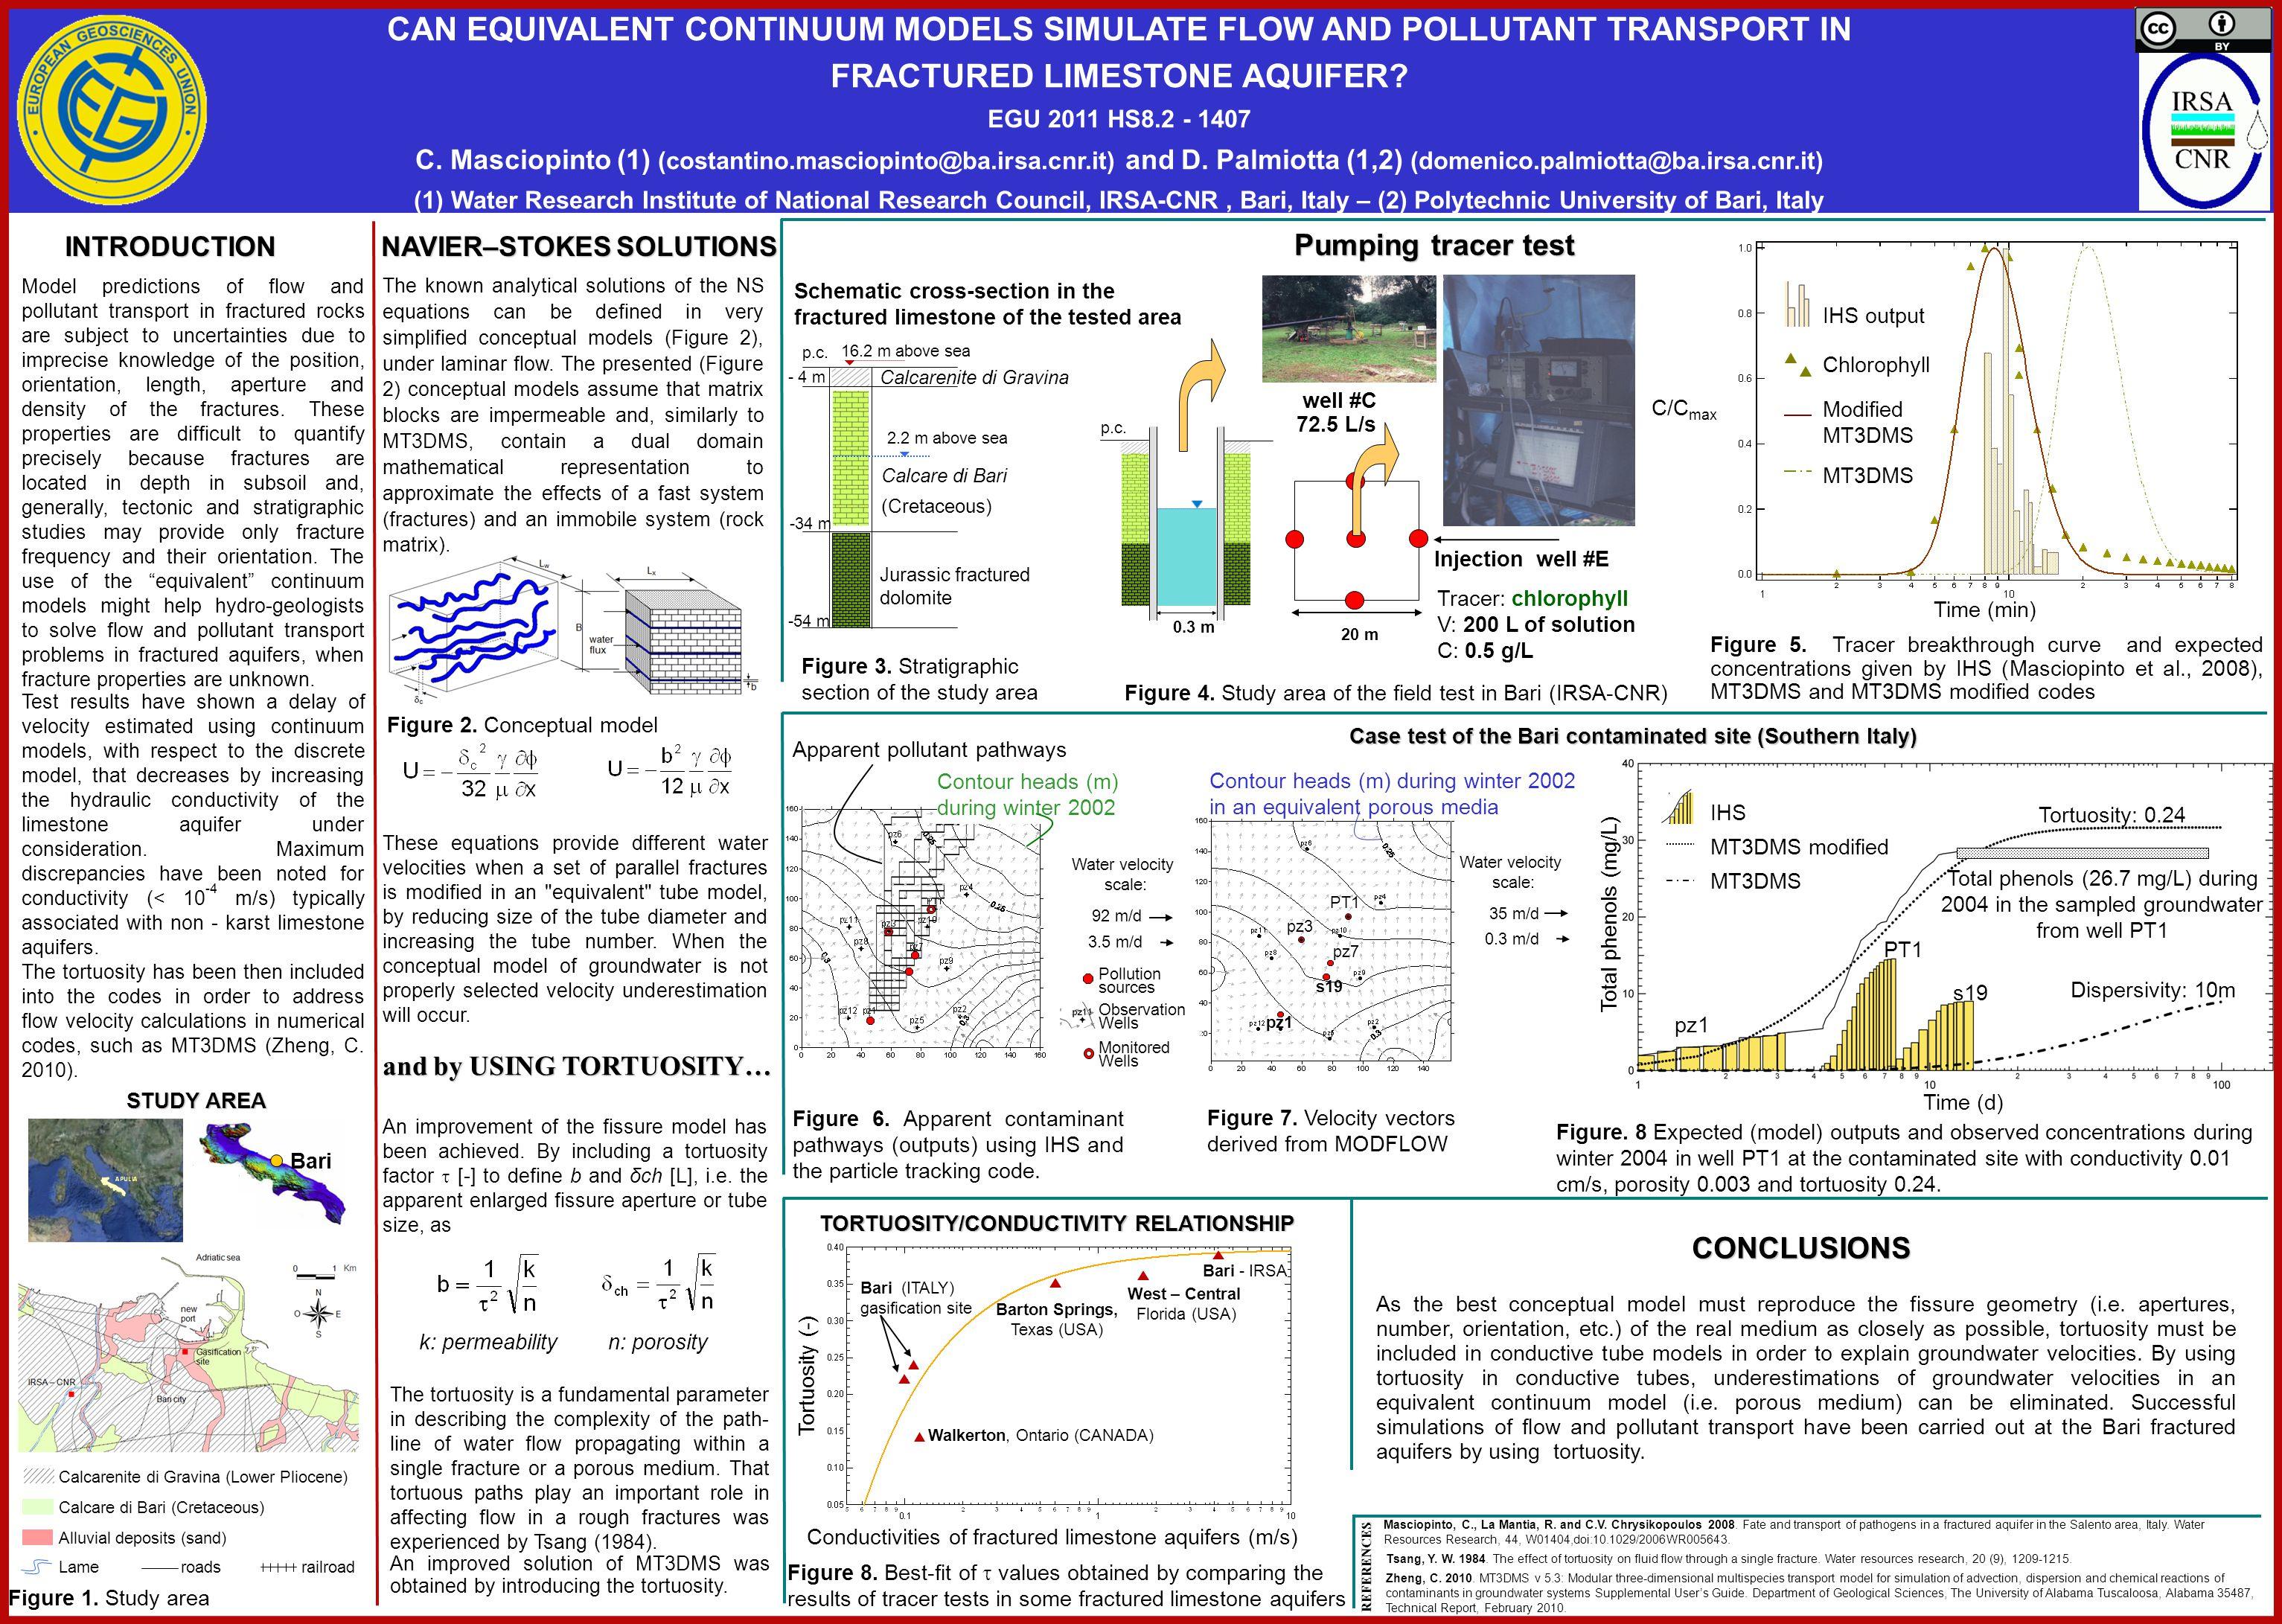 Conductivities of fractured limestone aquifers (m/s) Tortuosity (-) Walkerton, Ontario (CANADA) Bari (ITALY) gasification site Bari - IRSA West – Cent